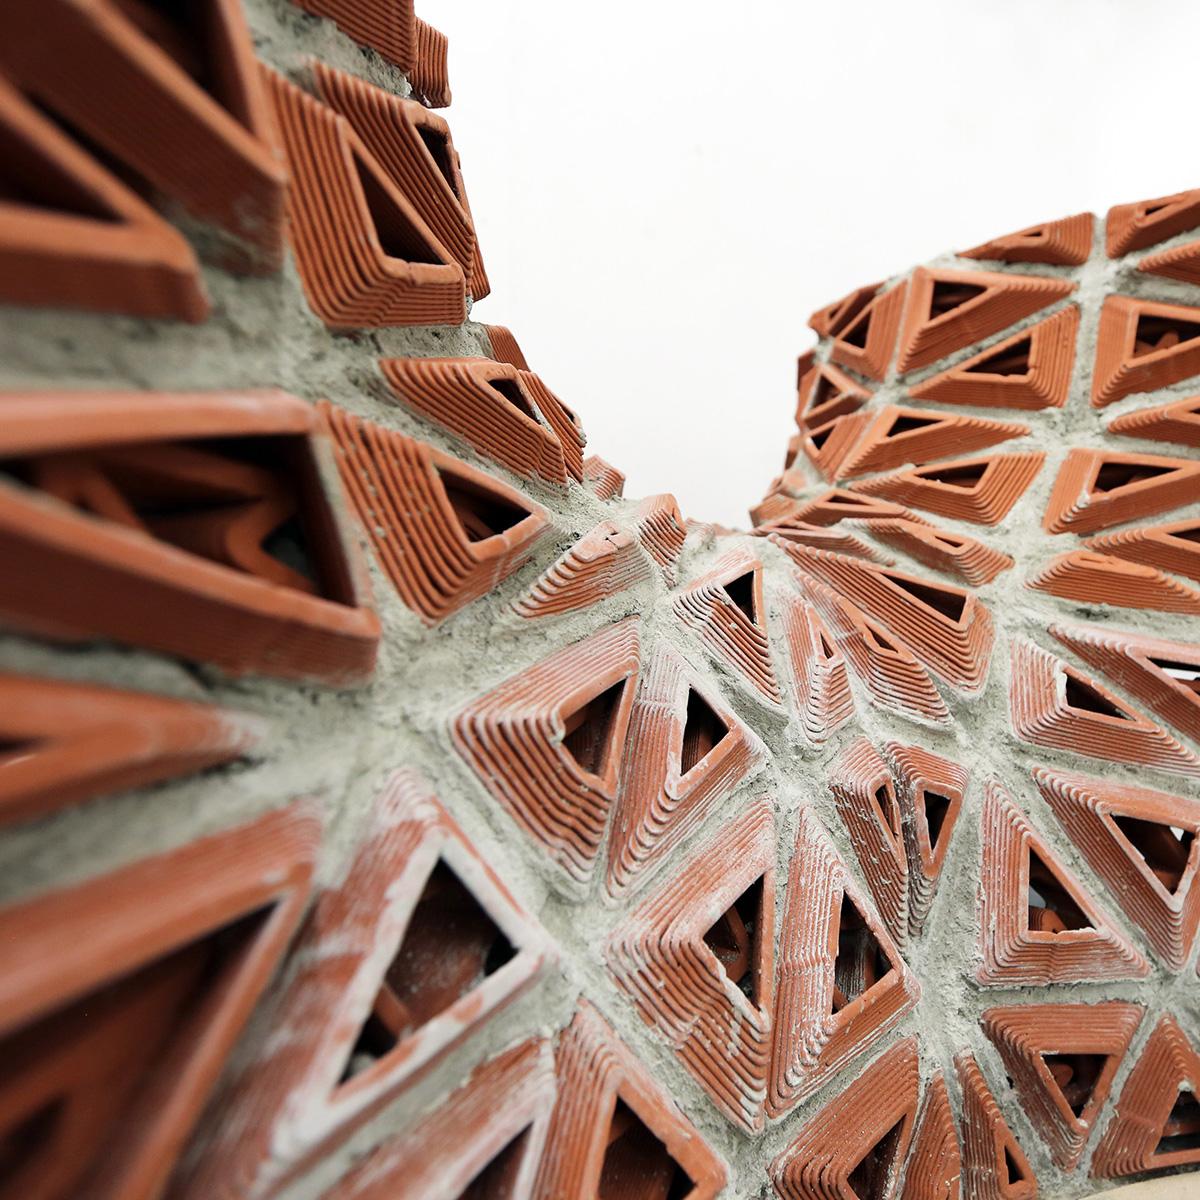 3d printed brick, terracotta, Hong Kong, architecture, Christian J Lange